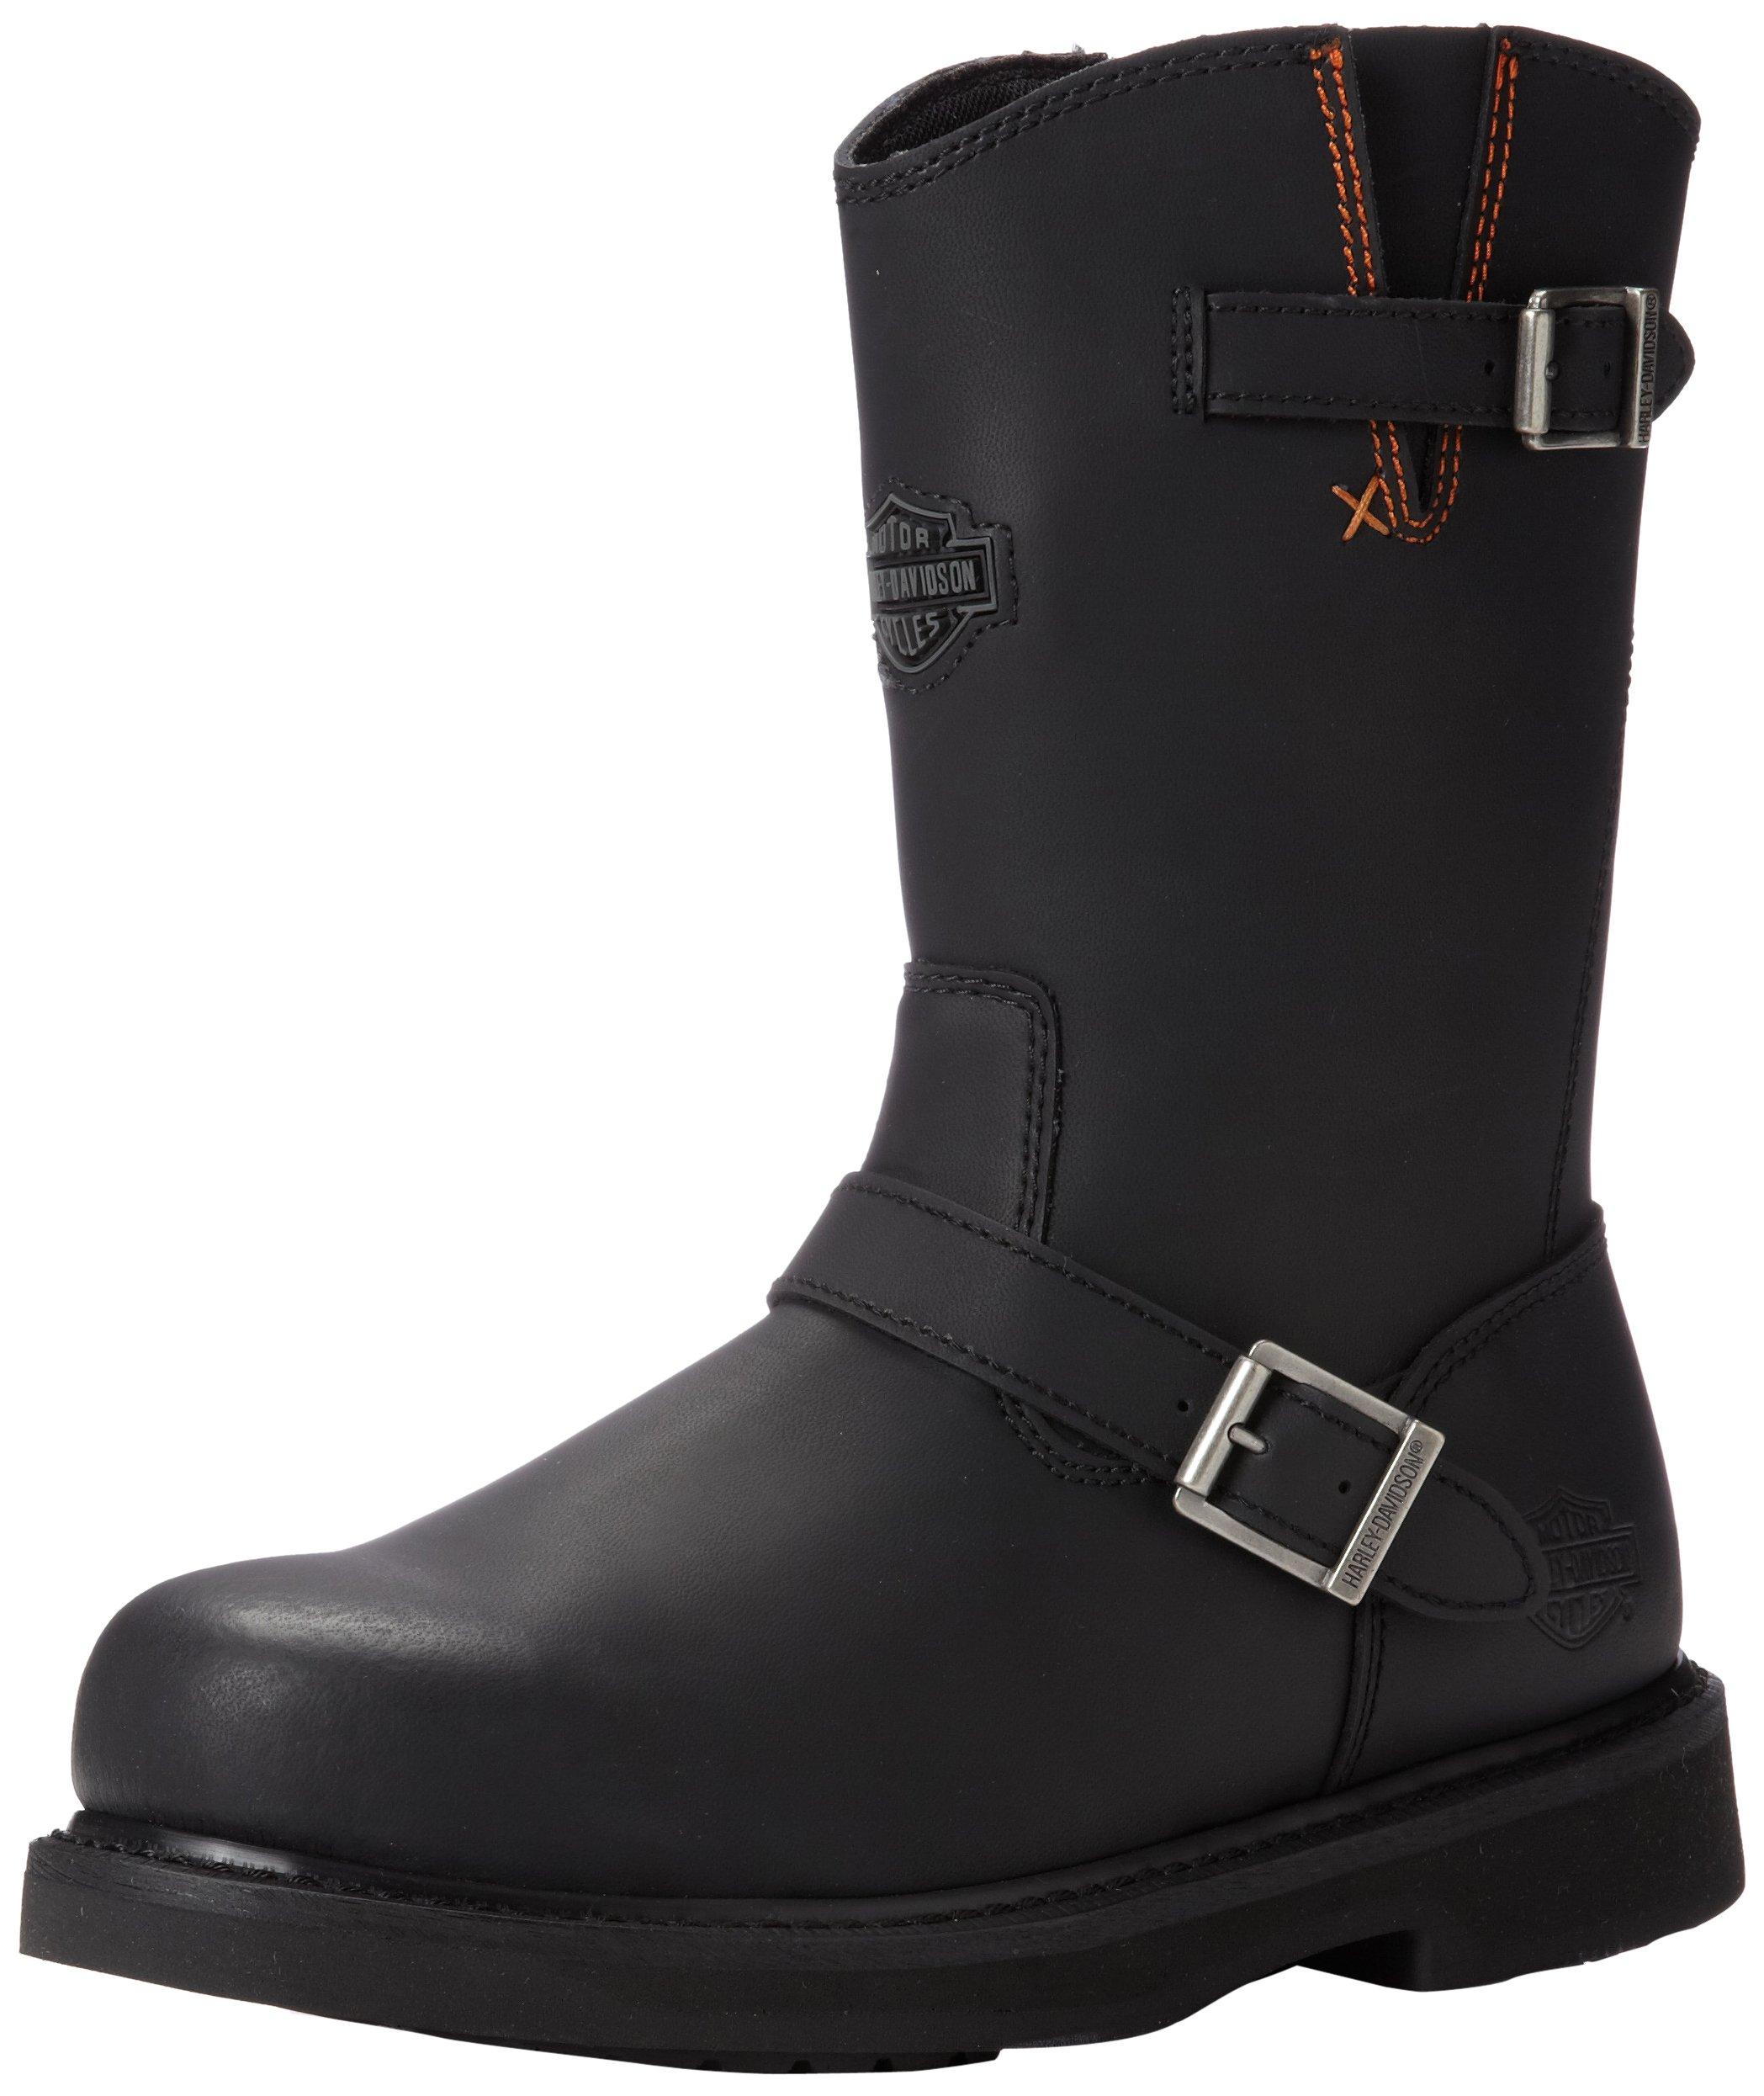 Harley-Davidson Men's Jason ST Engineer Safety Boot, Black, 13 M US